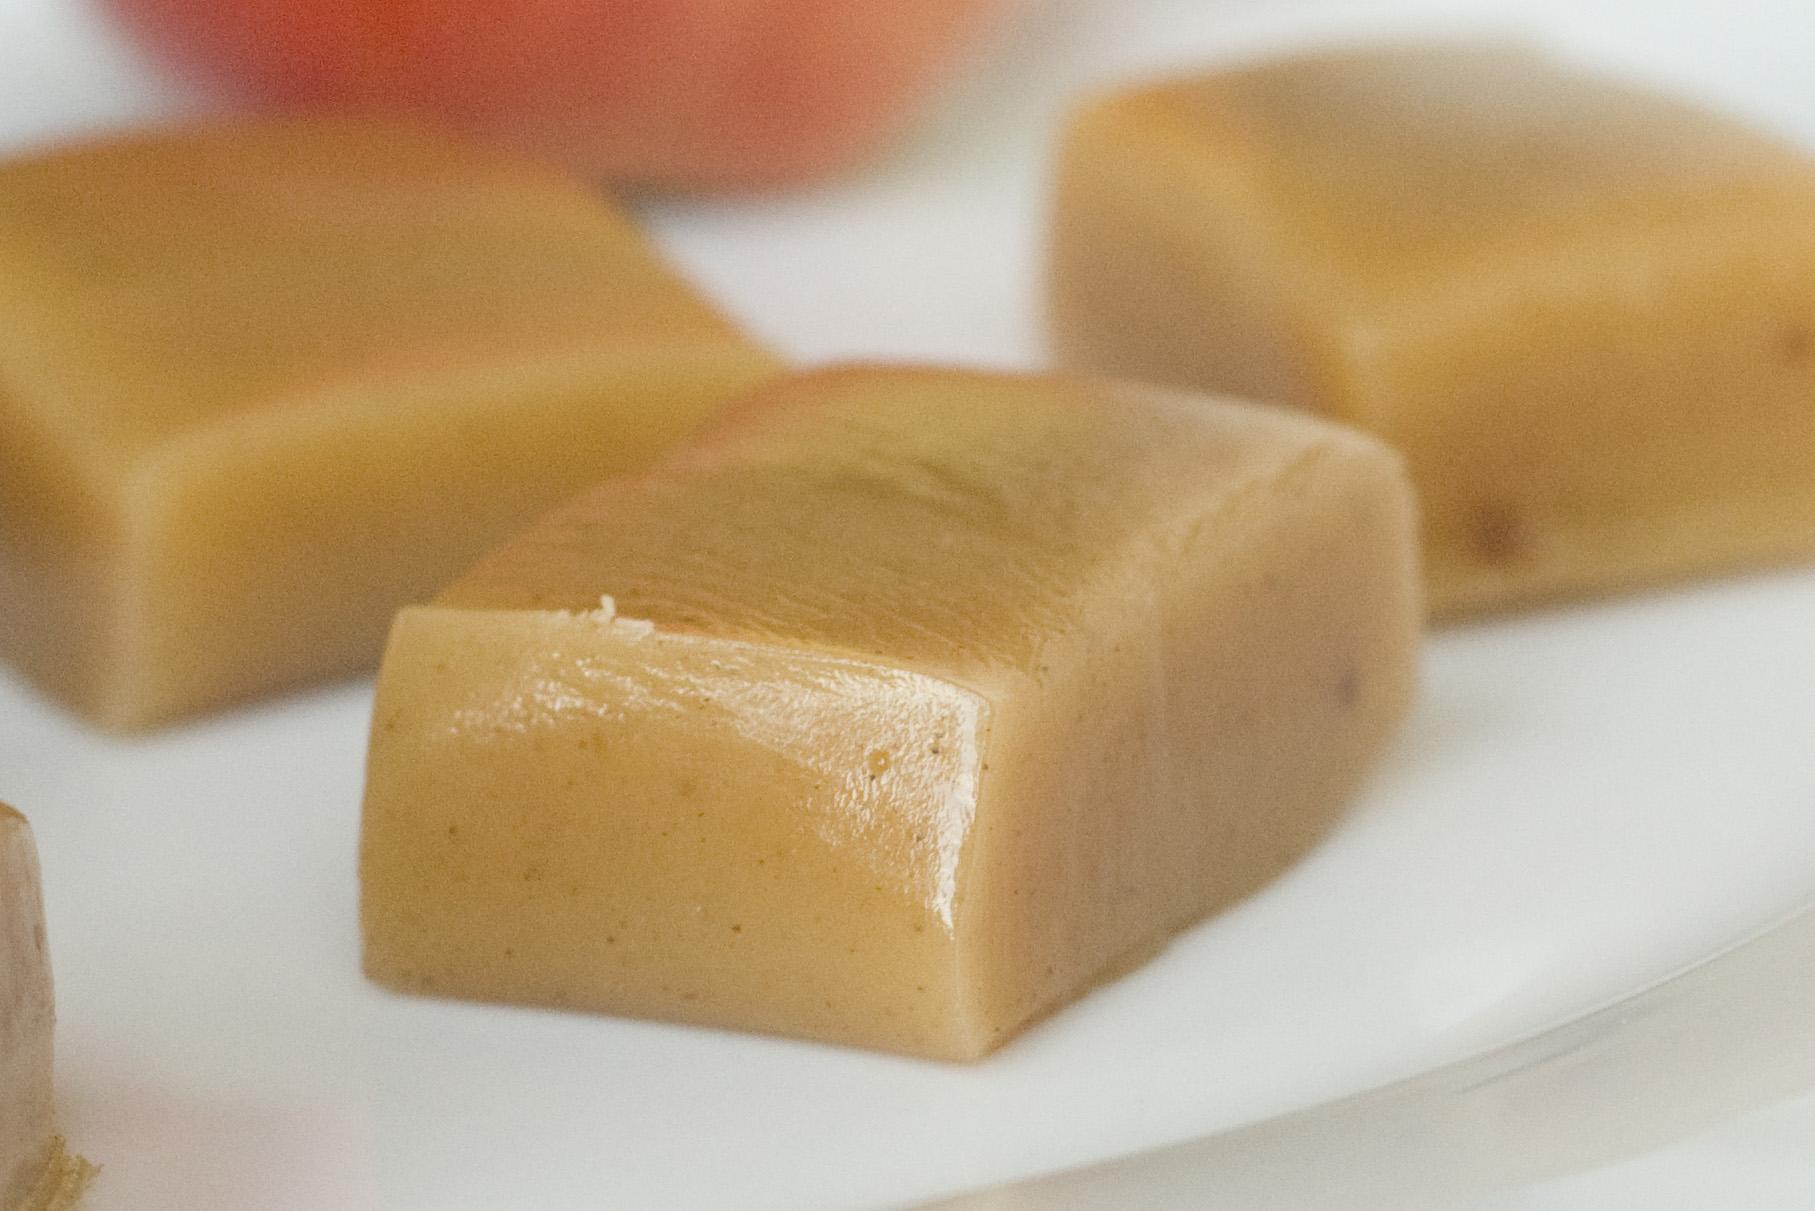 Apple Cider Caramels and Apple Teeth